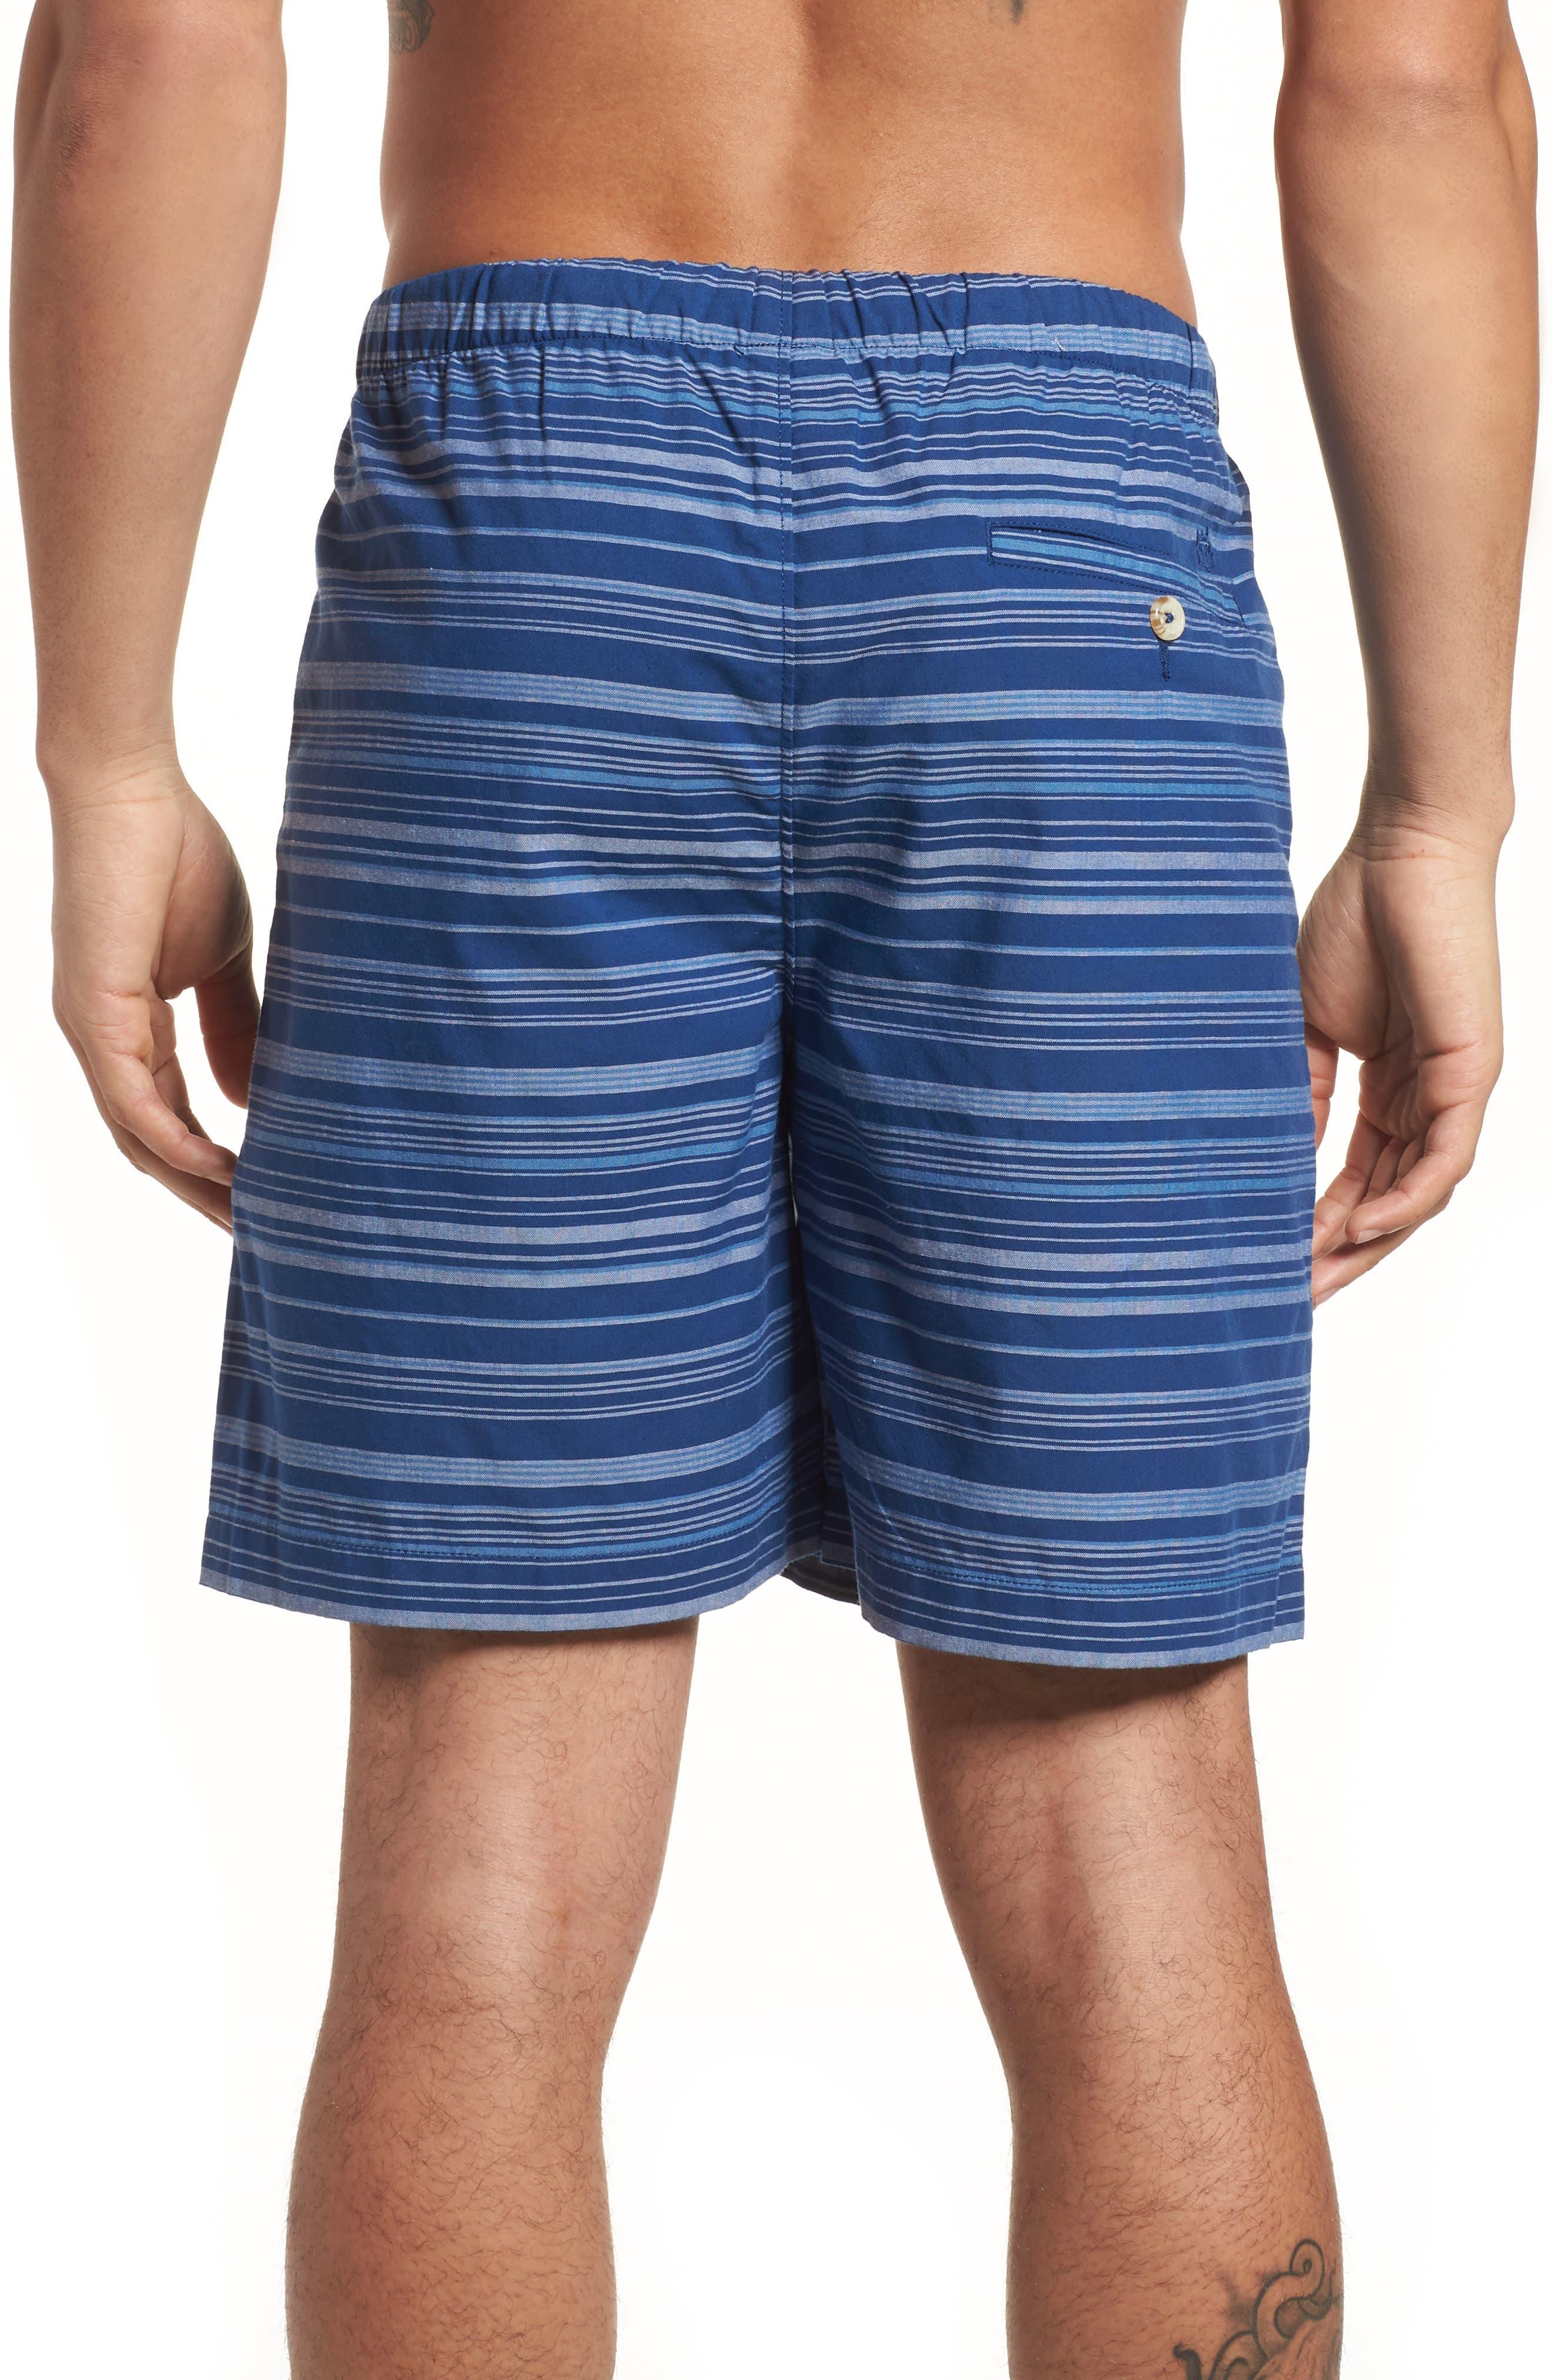 Hammock Board Shorts,                             Alternate thumbnail 2, color,                             425